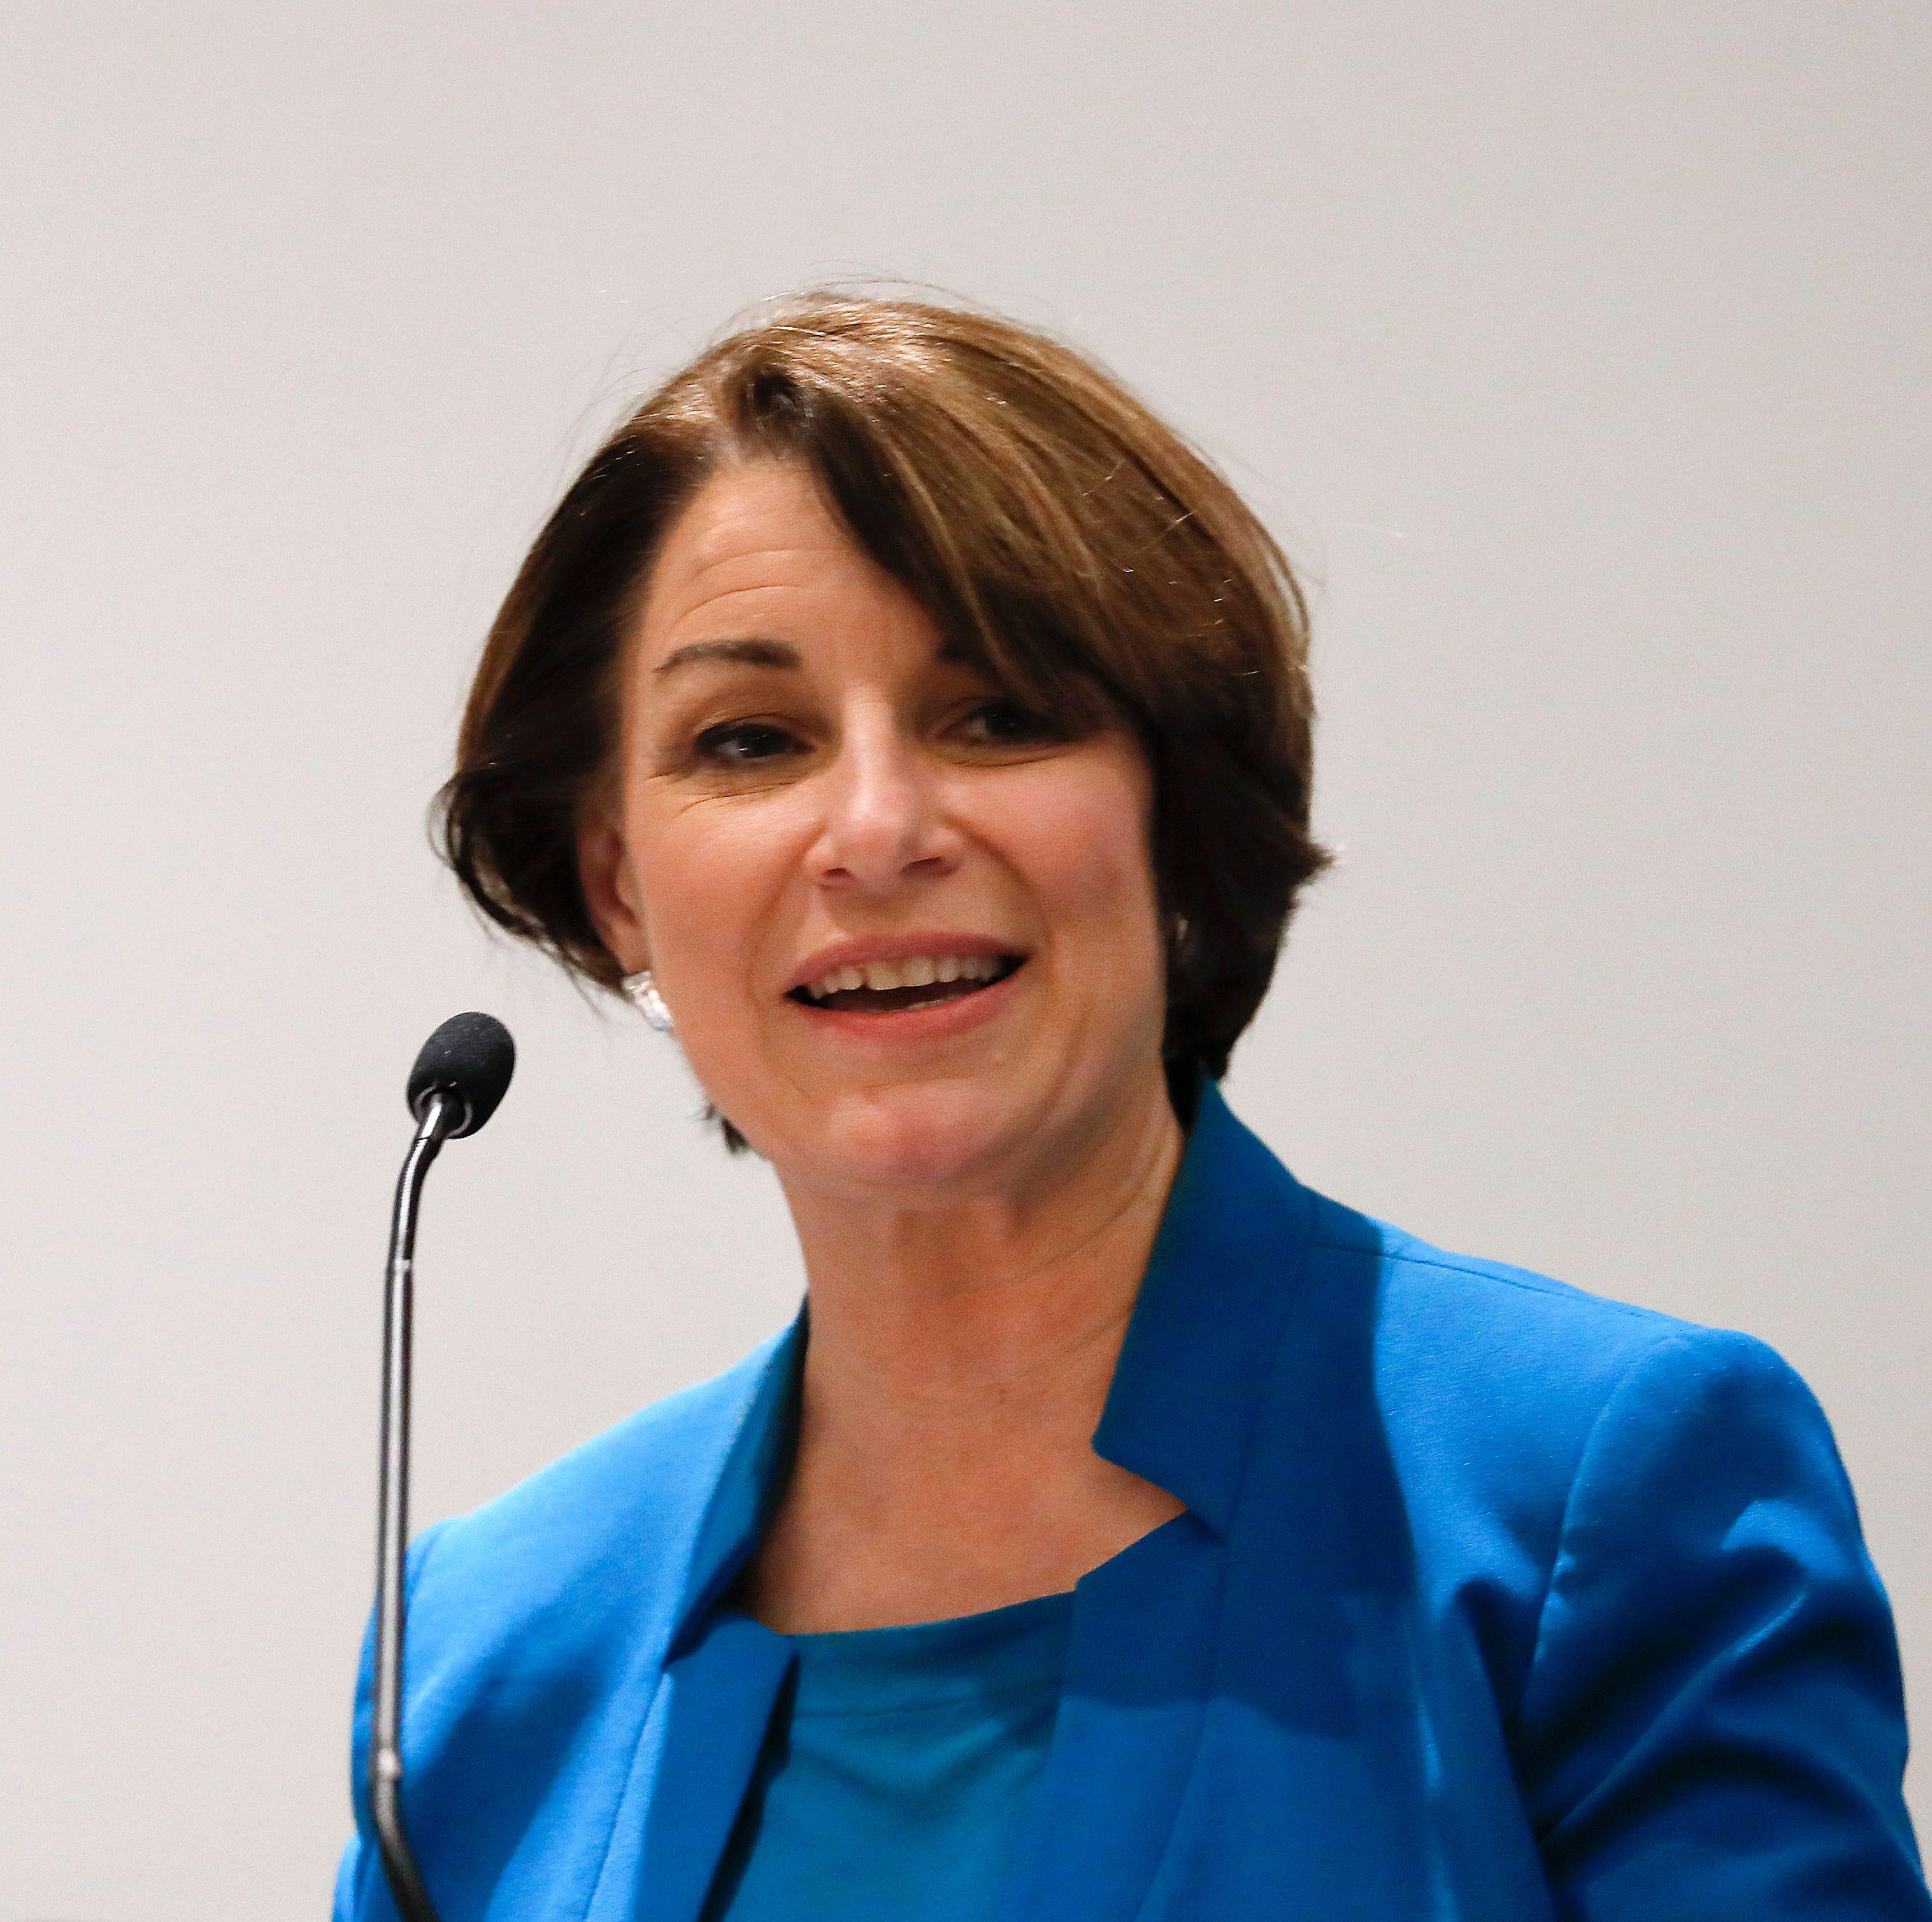 Democratic U.S. Sen. Amy Klobuchar of Minnesota.